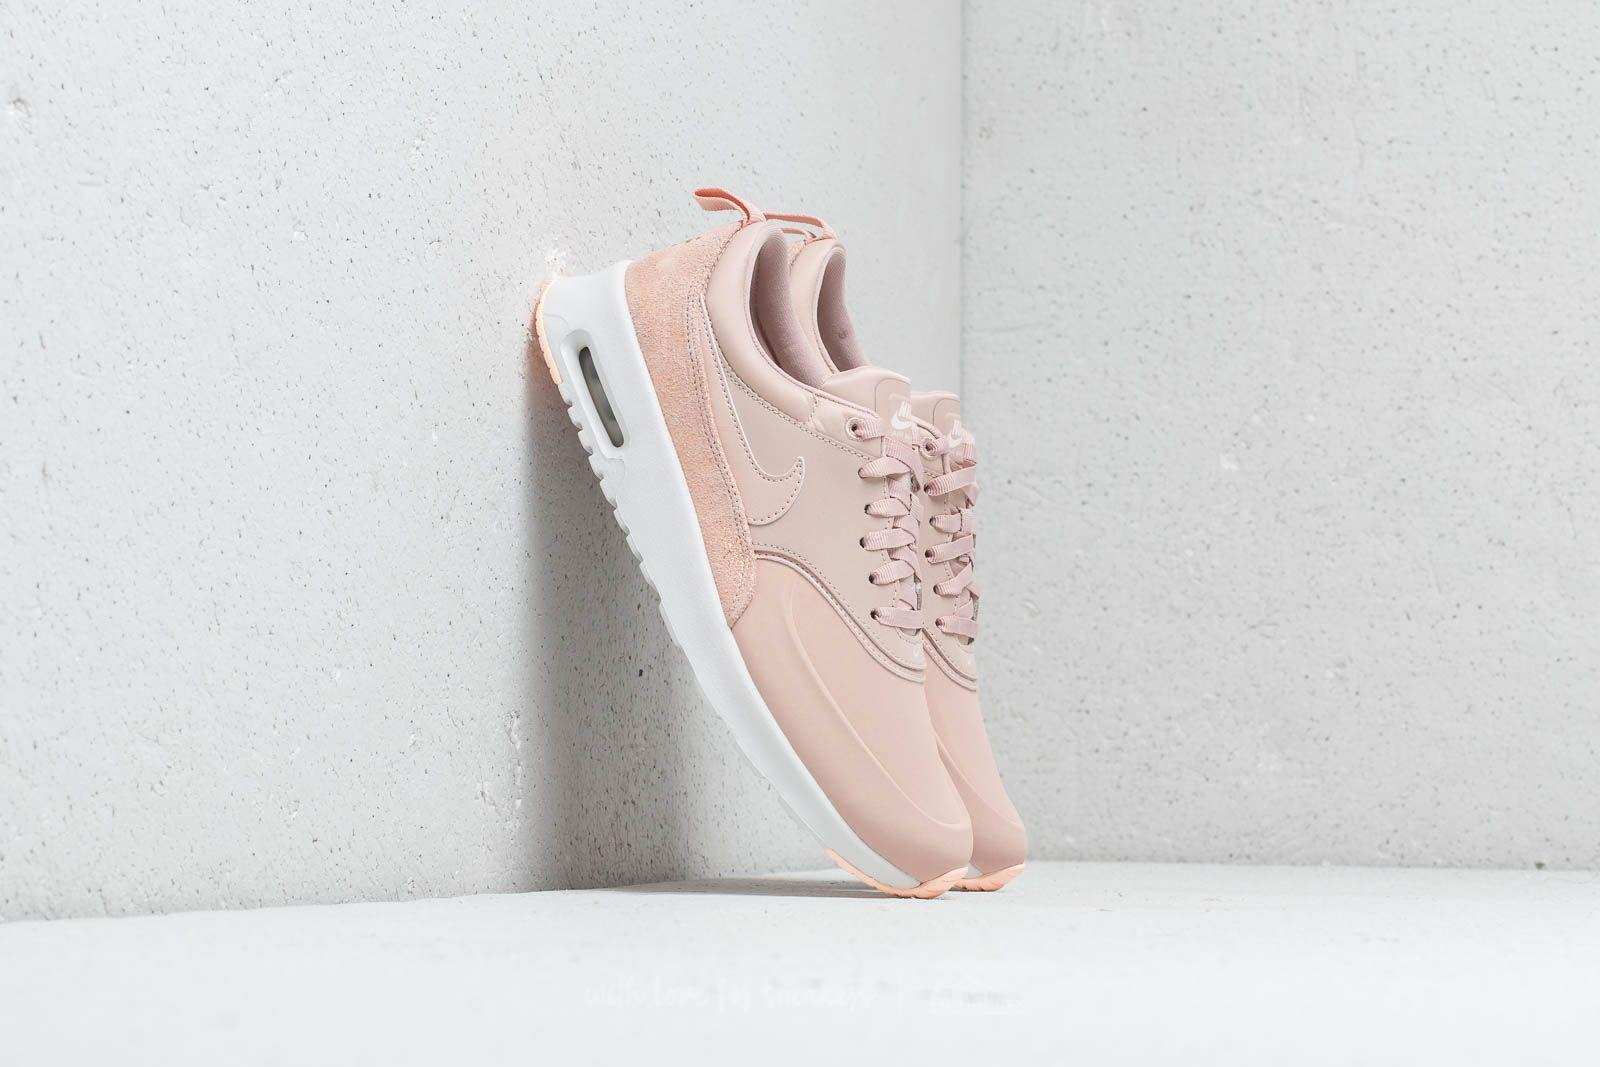 Nike Leather Wmns Air Max Thea Premium